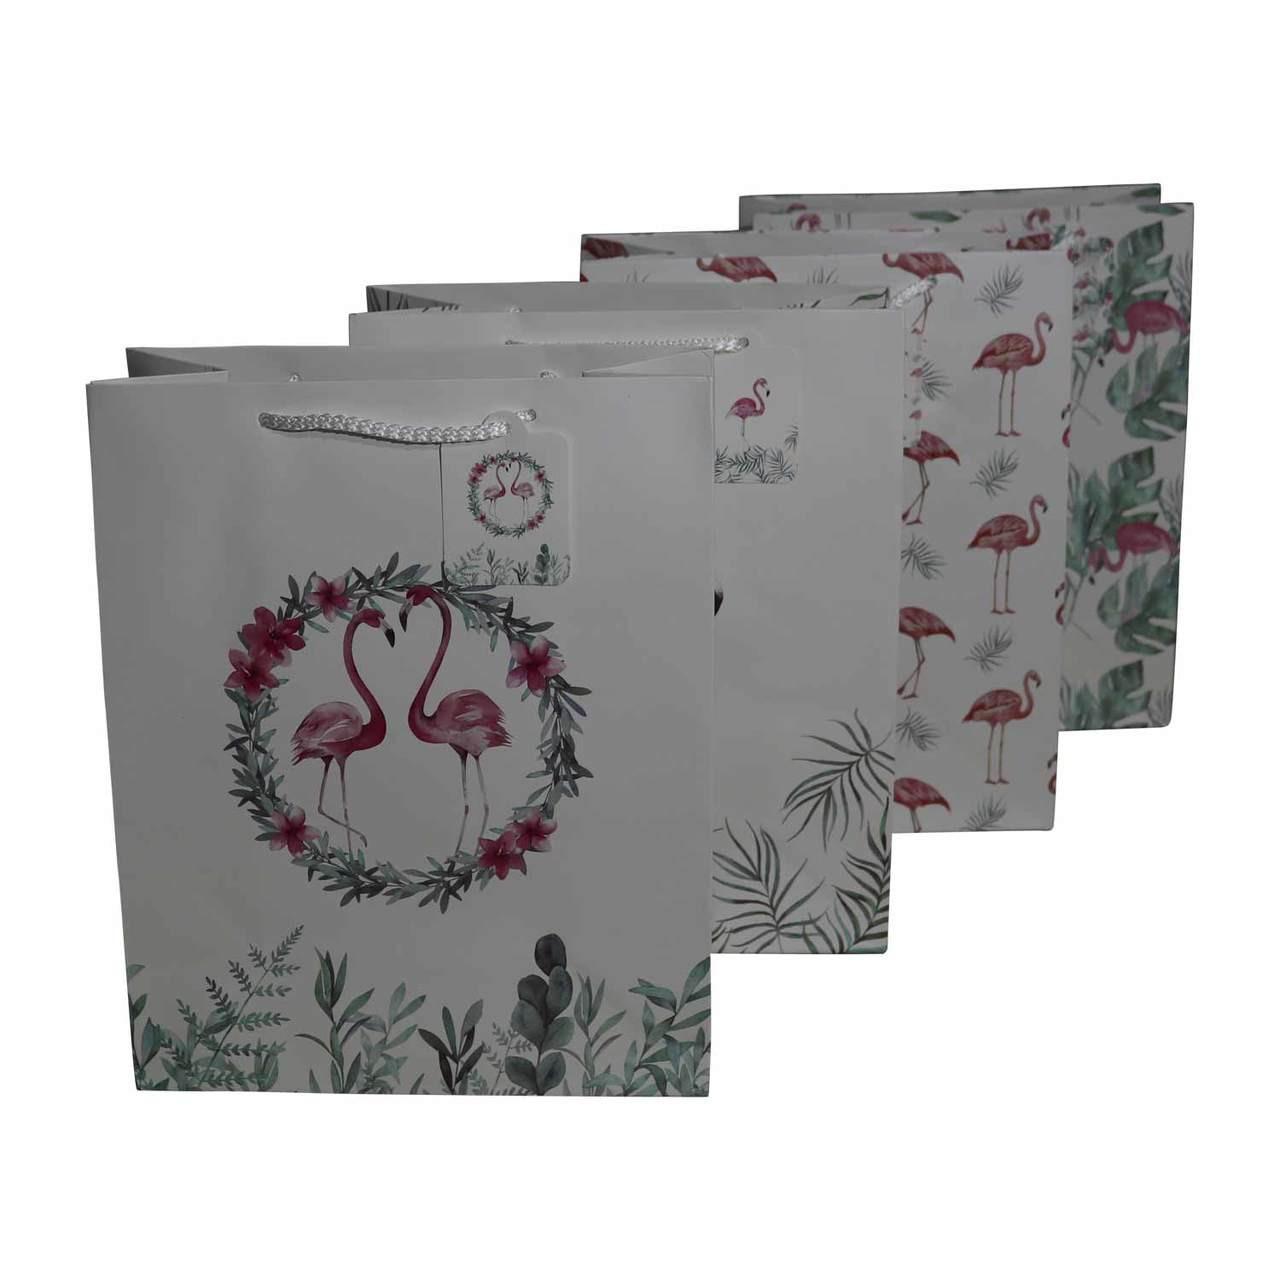 KRL2359M14 Gift Bags - Flamingos - Bali Trading Wholesale 63642735a